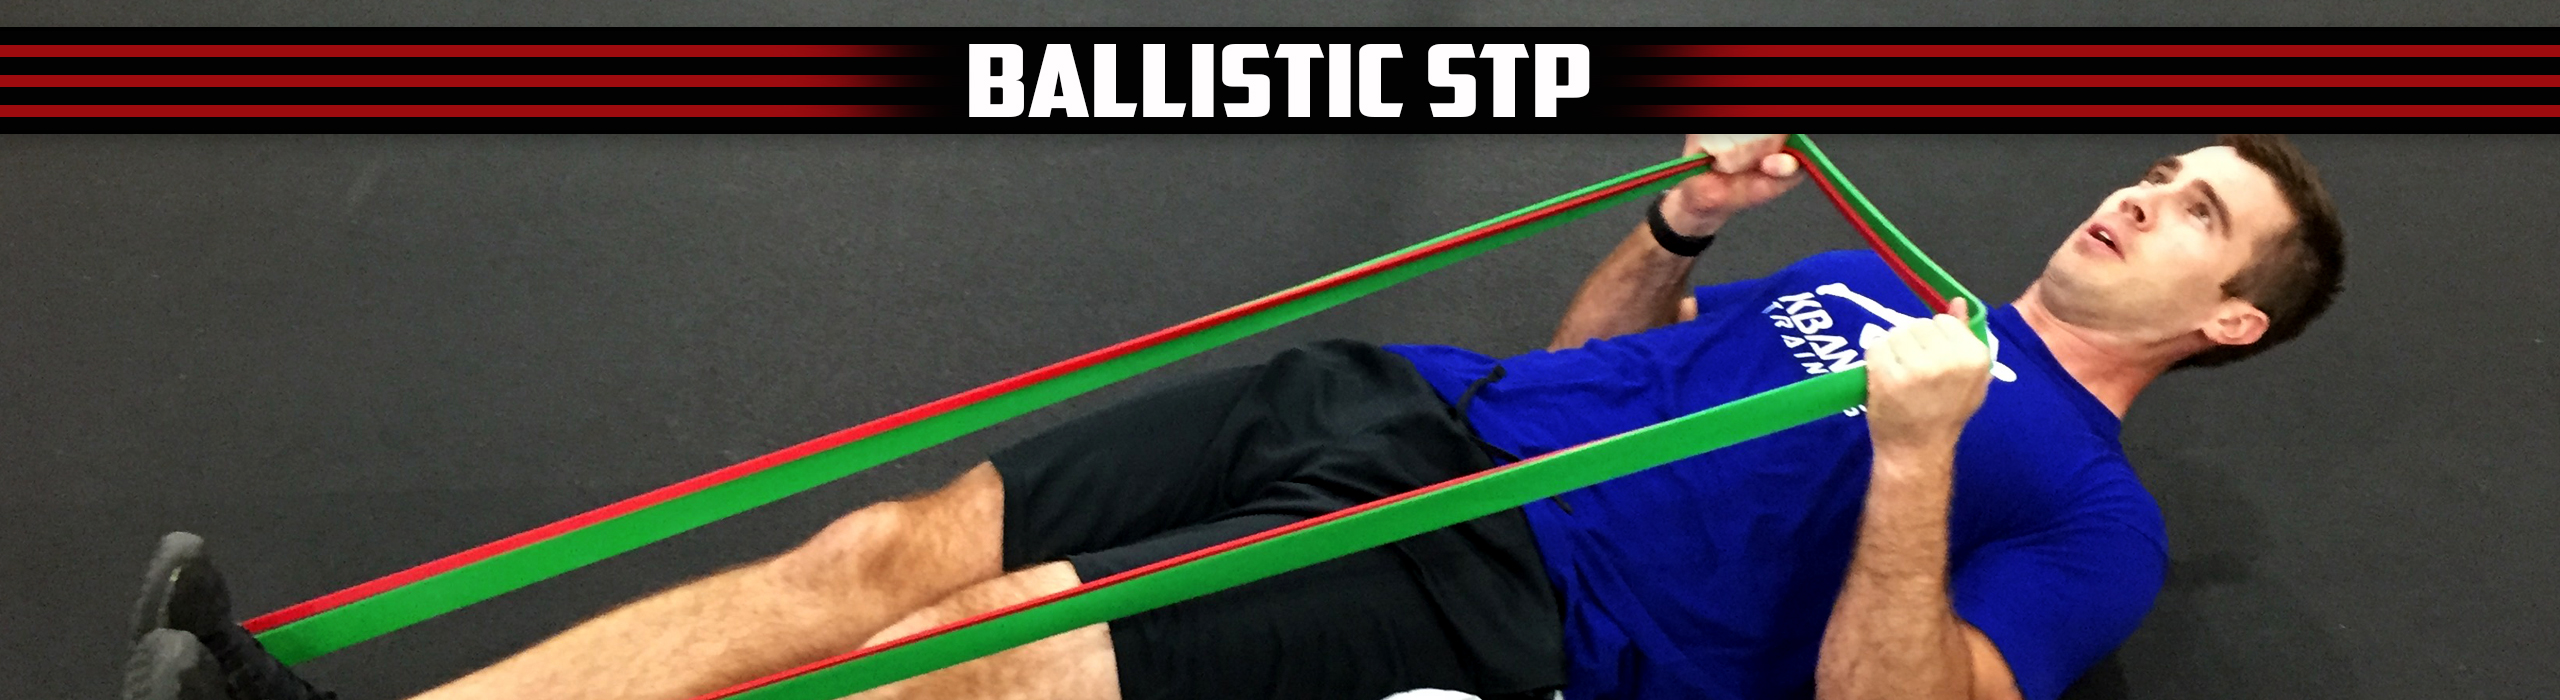 Ballistic STP